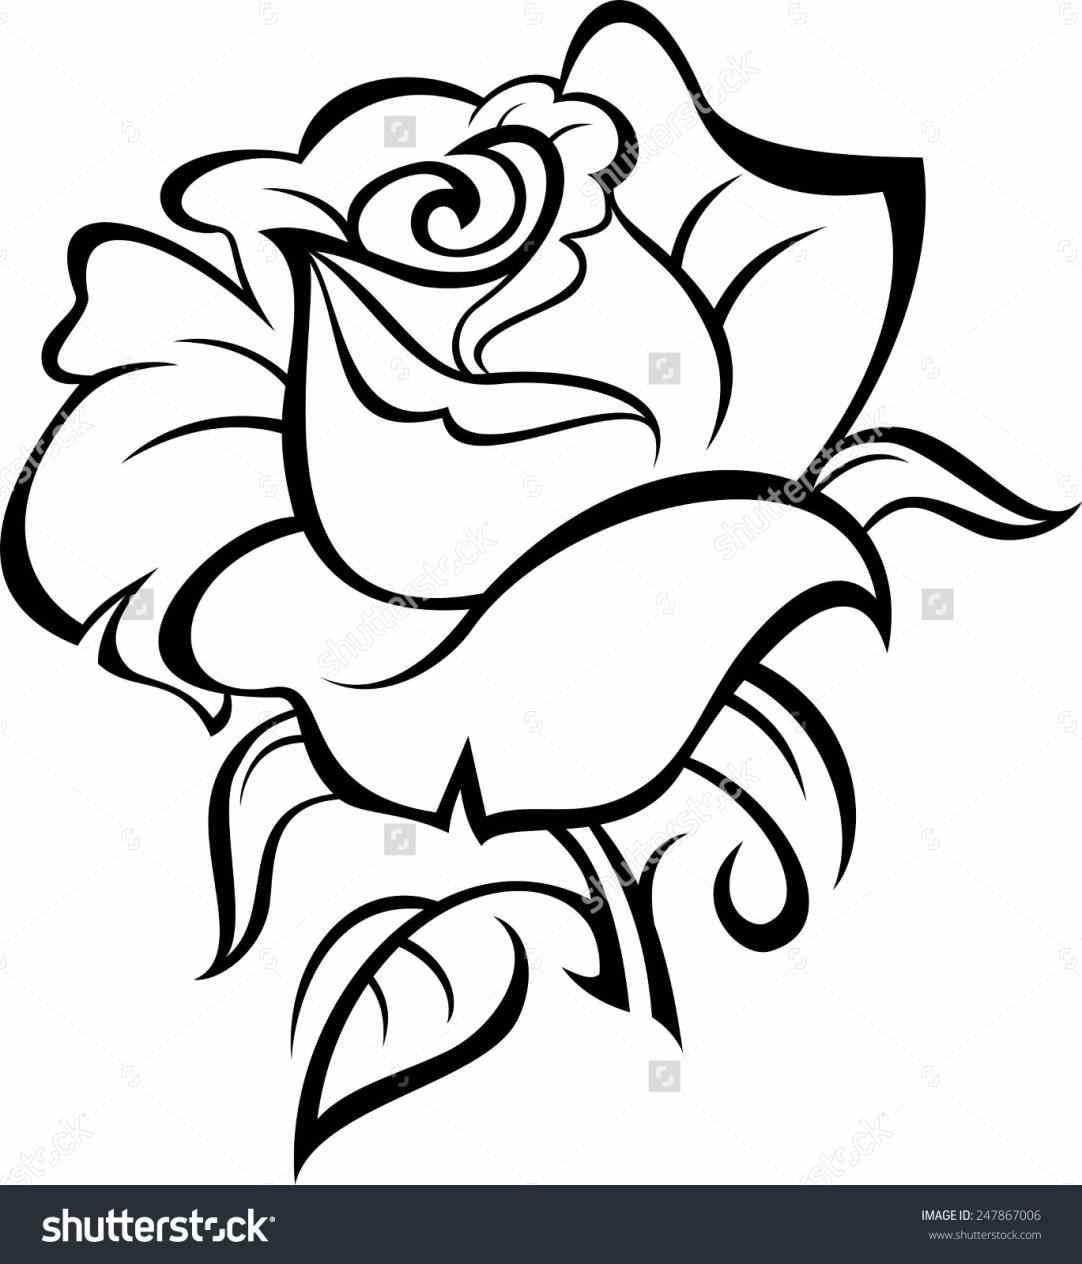 1082x1264 Monochrome Rose Bouquet Outline Clipart Rose Clipart Collection